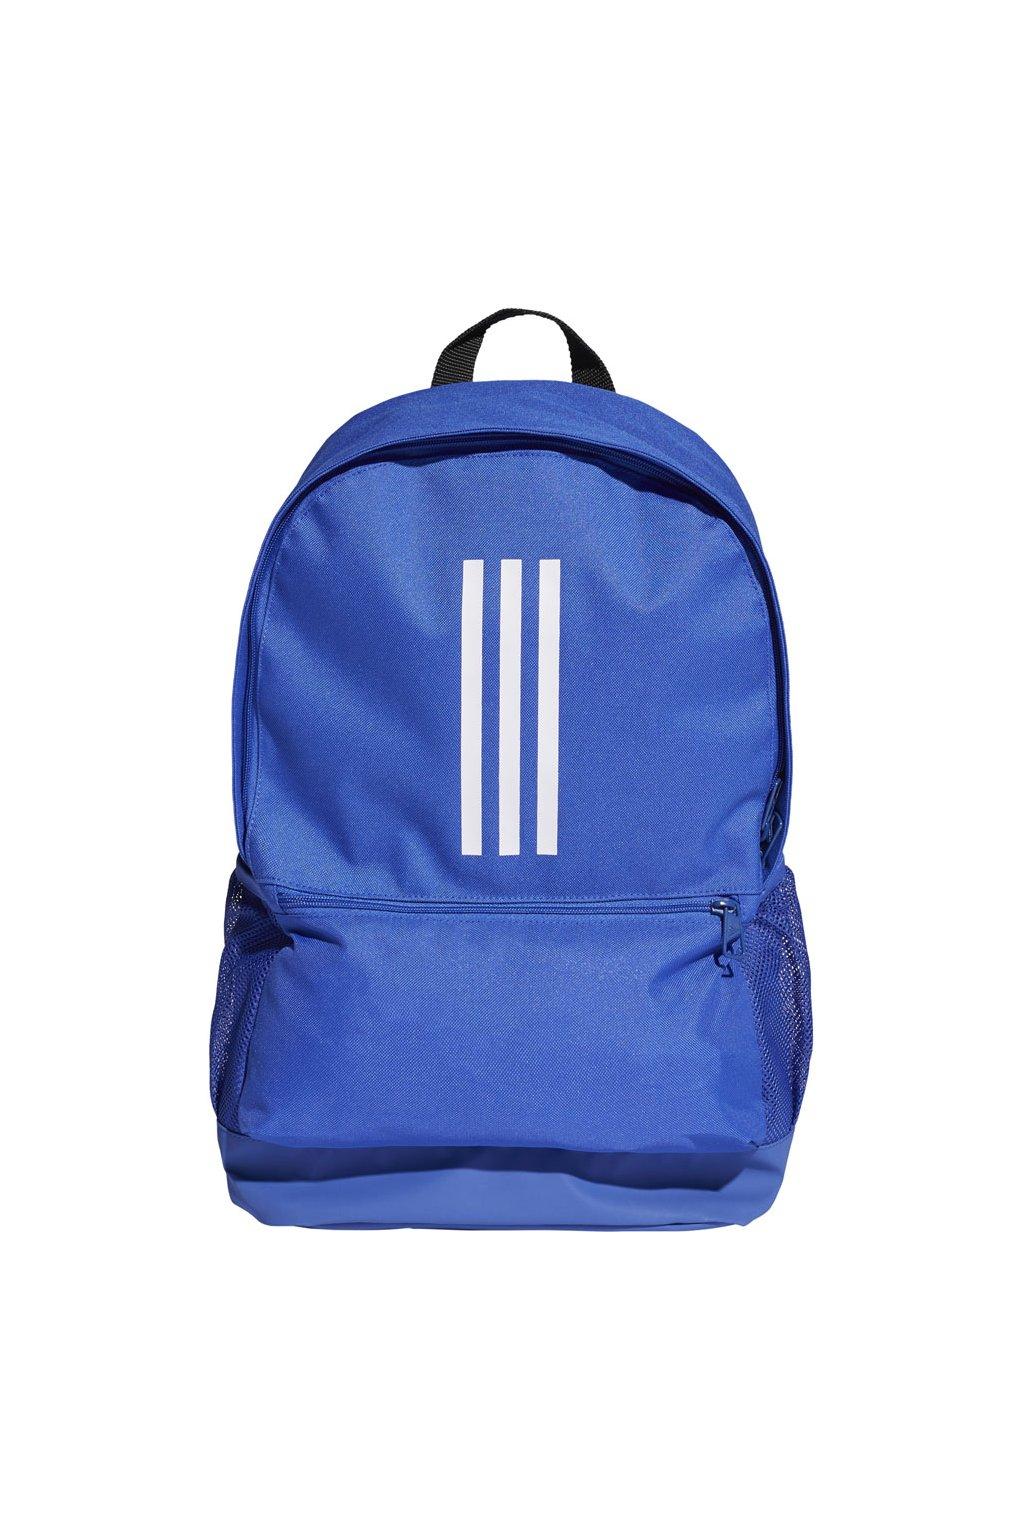 Batoh adidas Tiro BP modrý DU1996